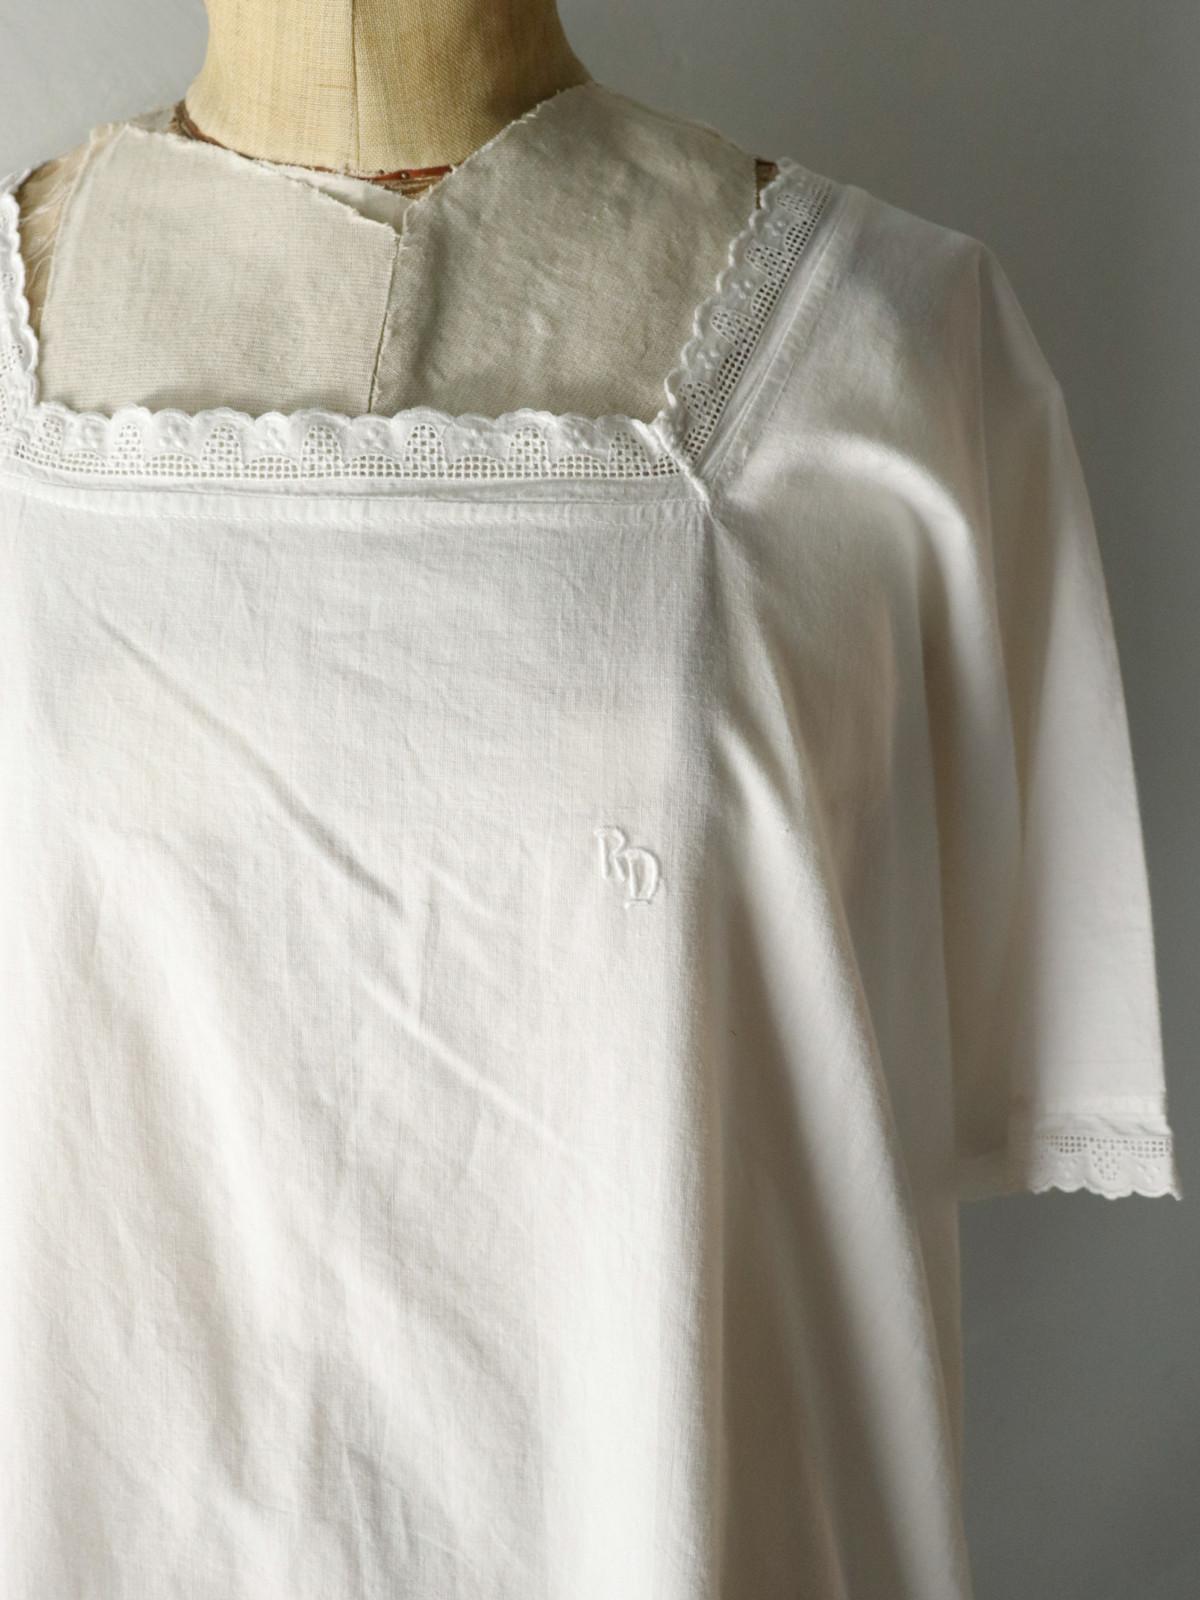 _vintage,europe,linen,cotton,nightwear,lace,enbroidery,onepiece